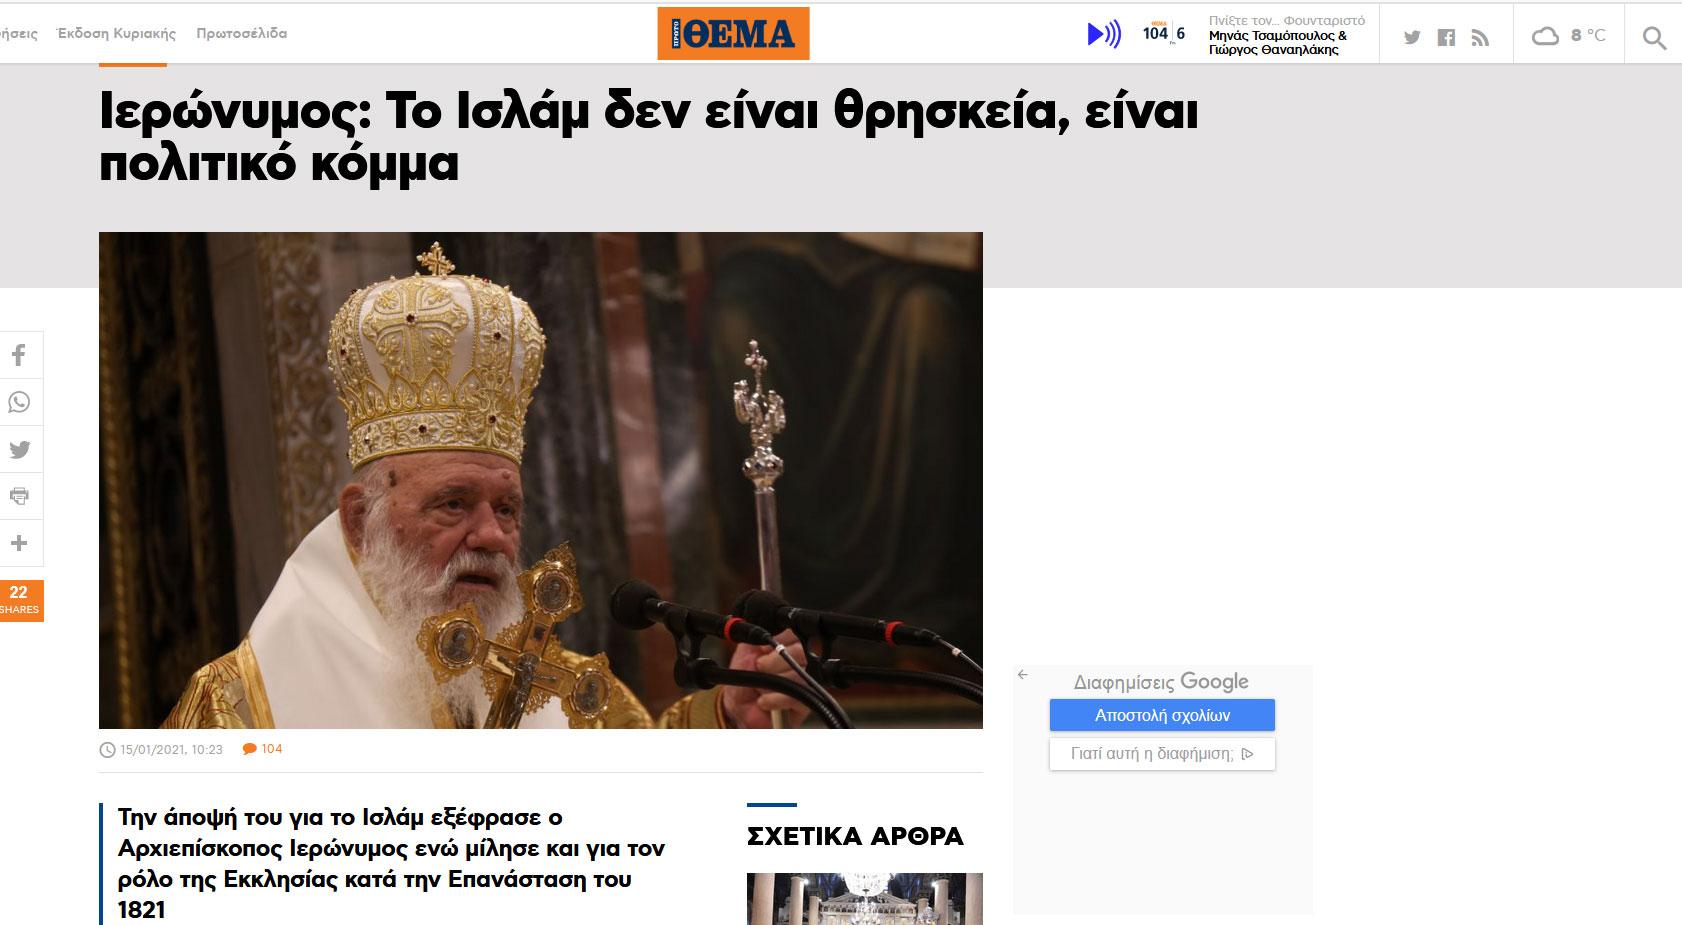 Yunanistan Başpiskoposu İslam'a hakaret etti